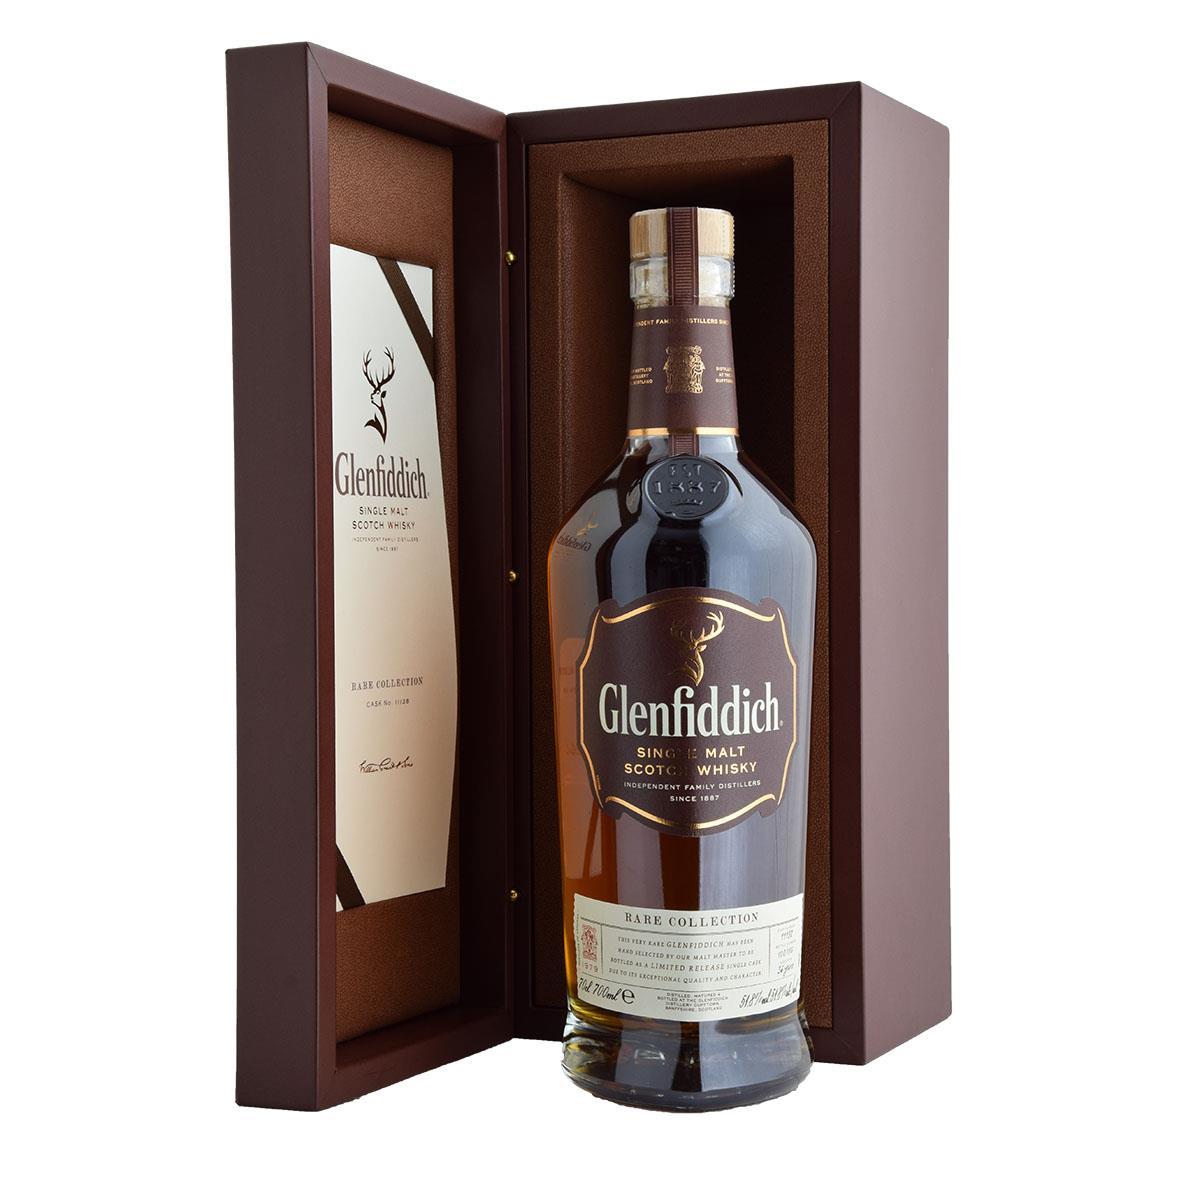 Glenfiddich Rare Collection 1979 36 y.o. 700ml